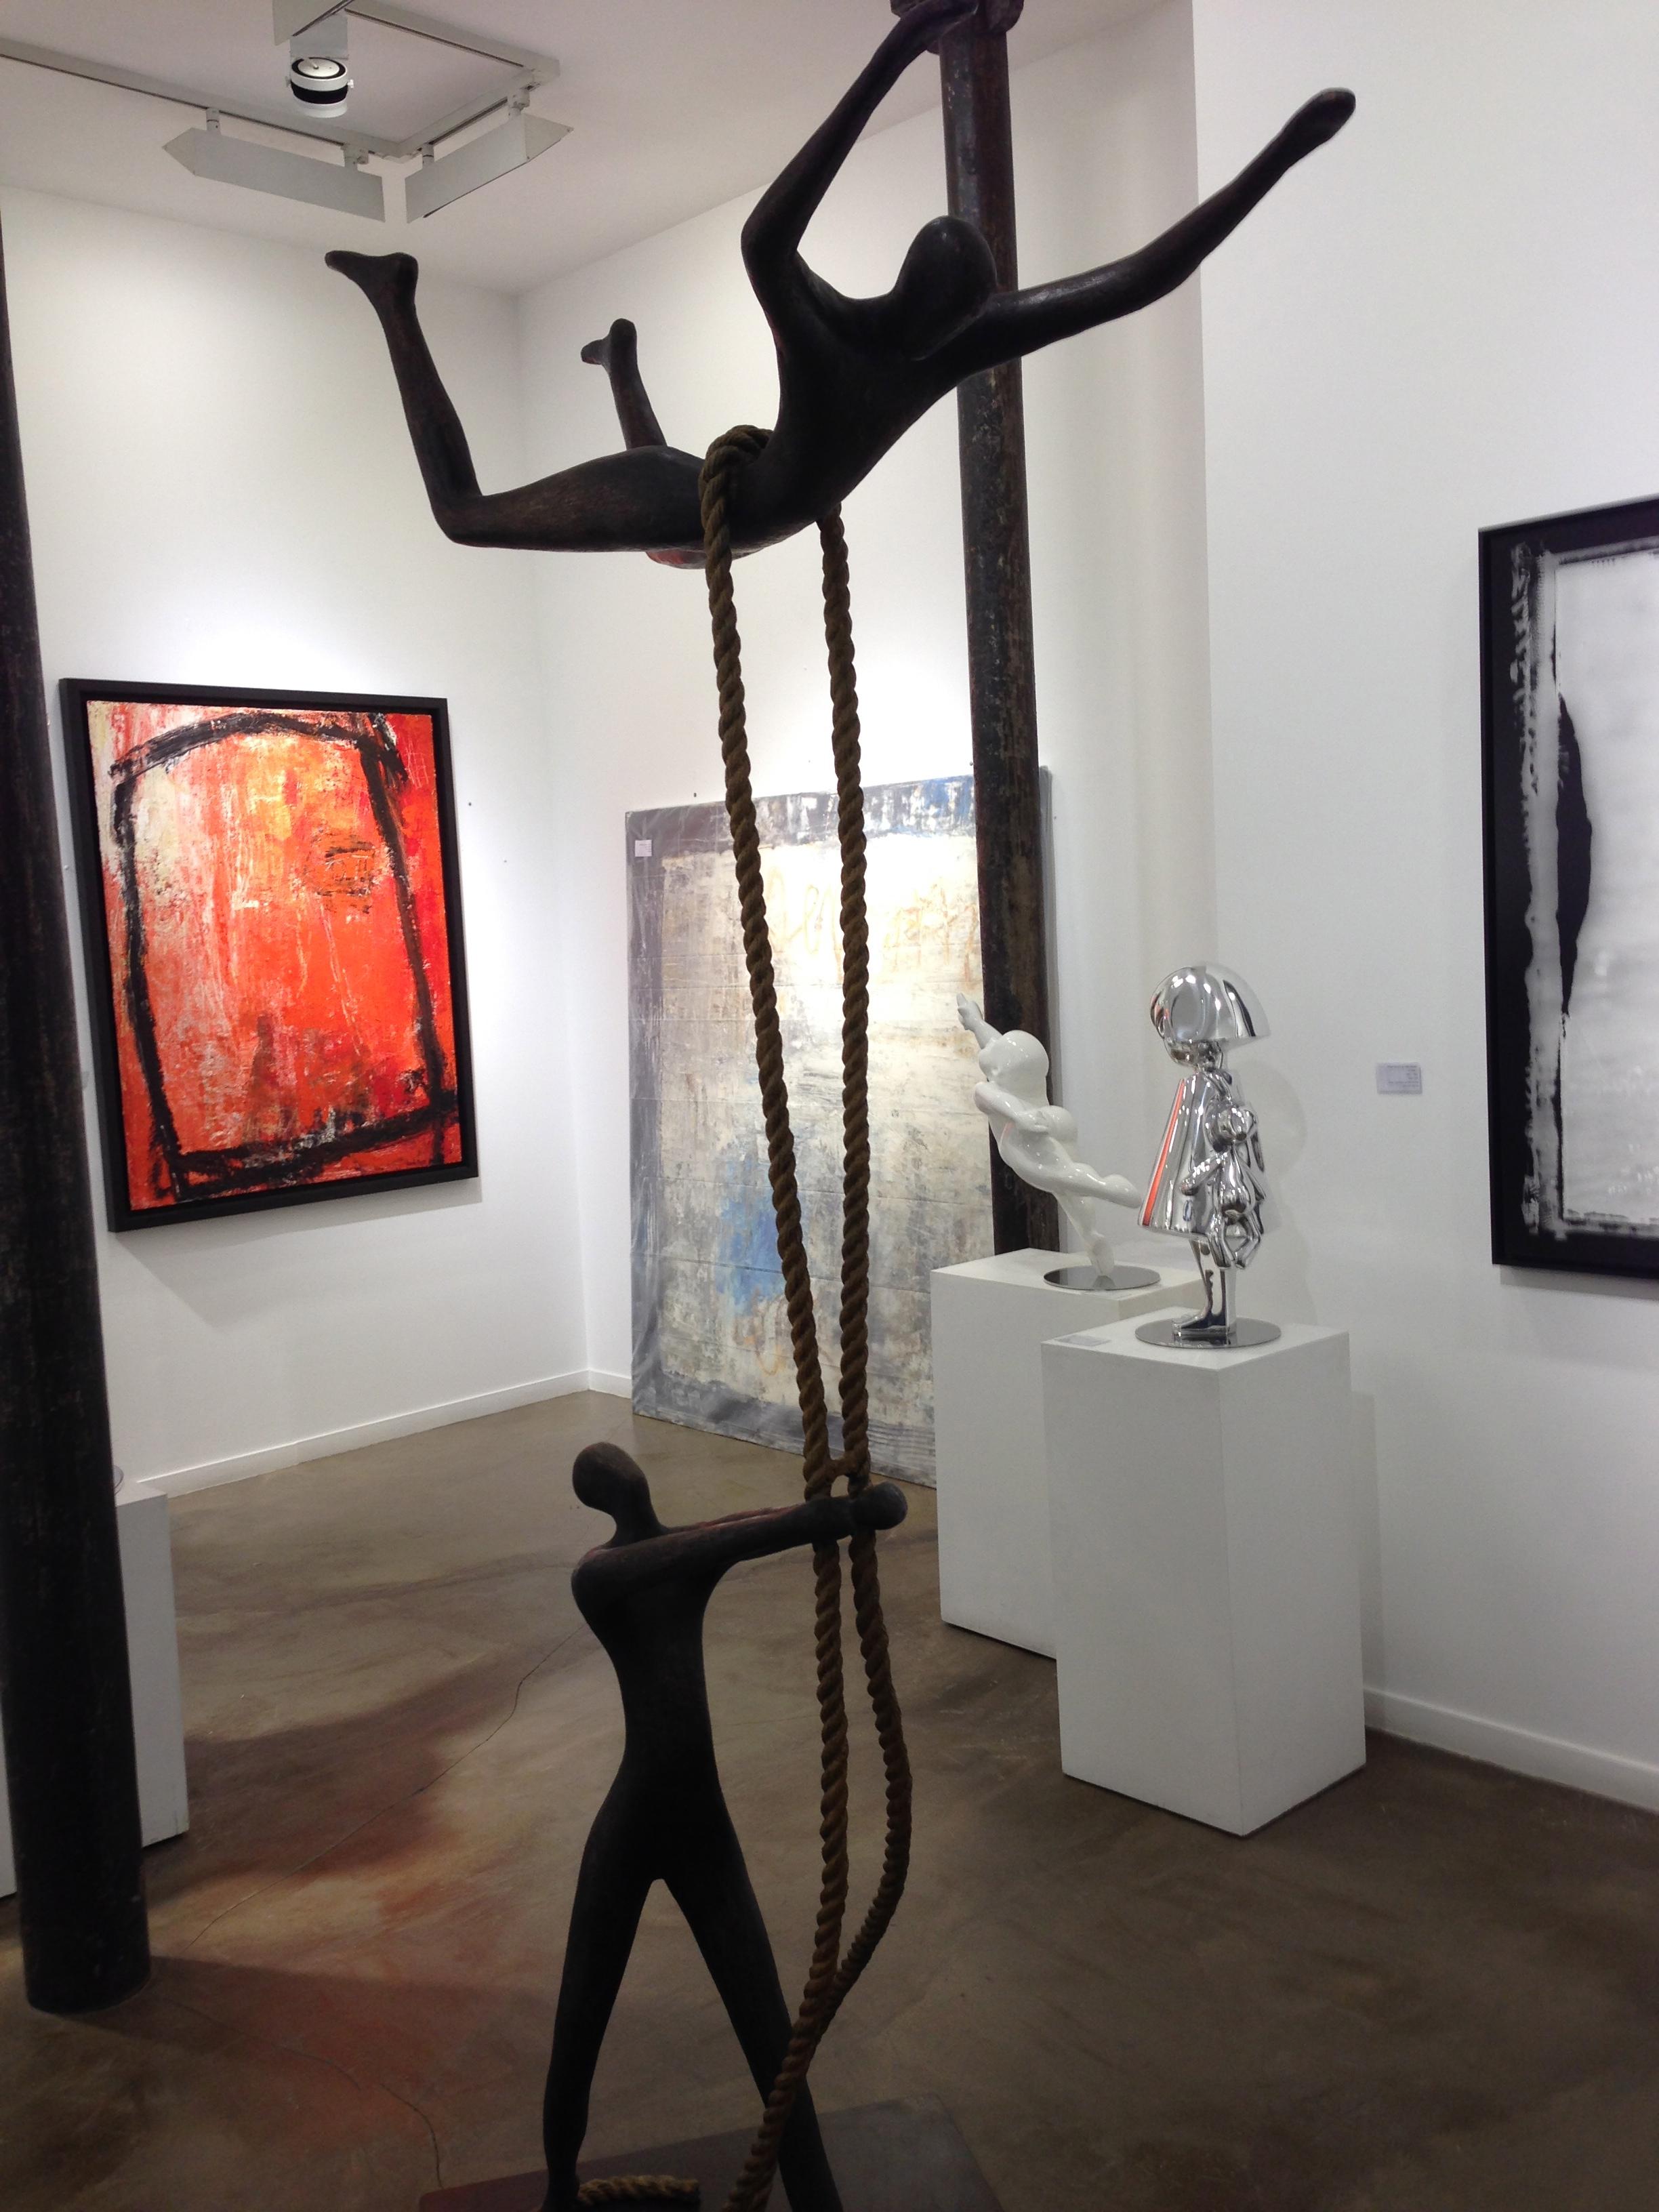 Inbar Tolla's 'Sky High' @ Galerie Frederic Got, Paris 3.12.13